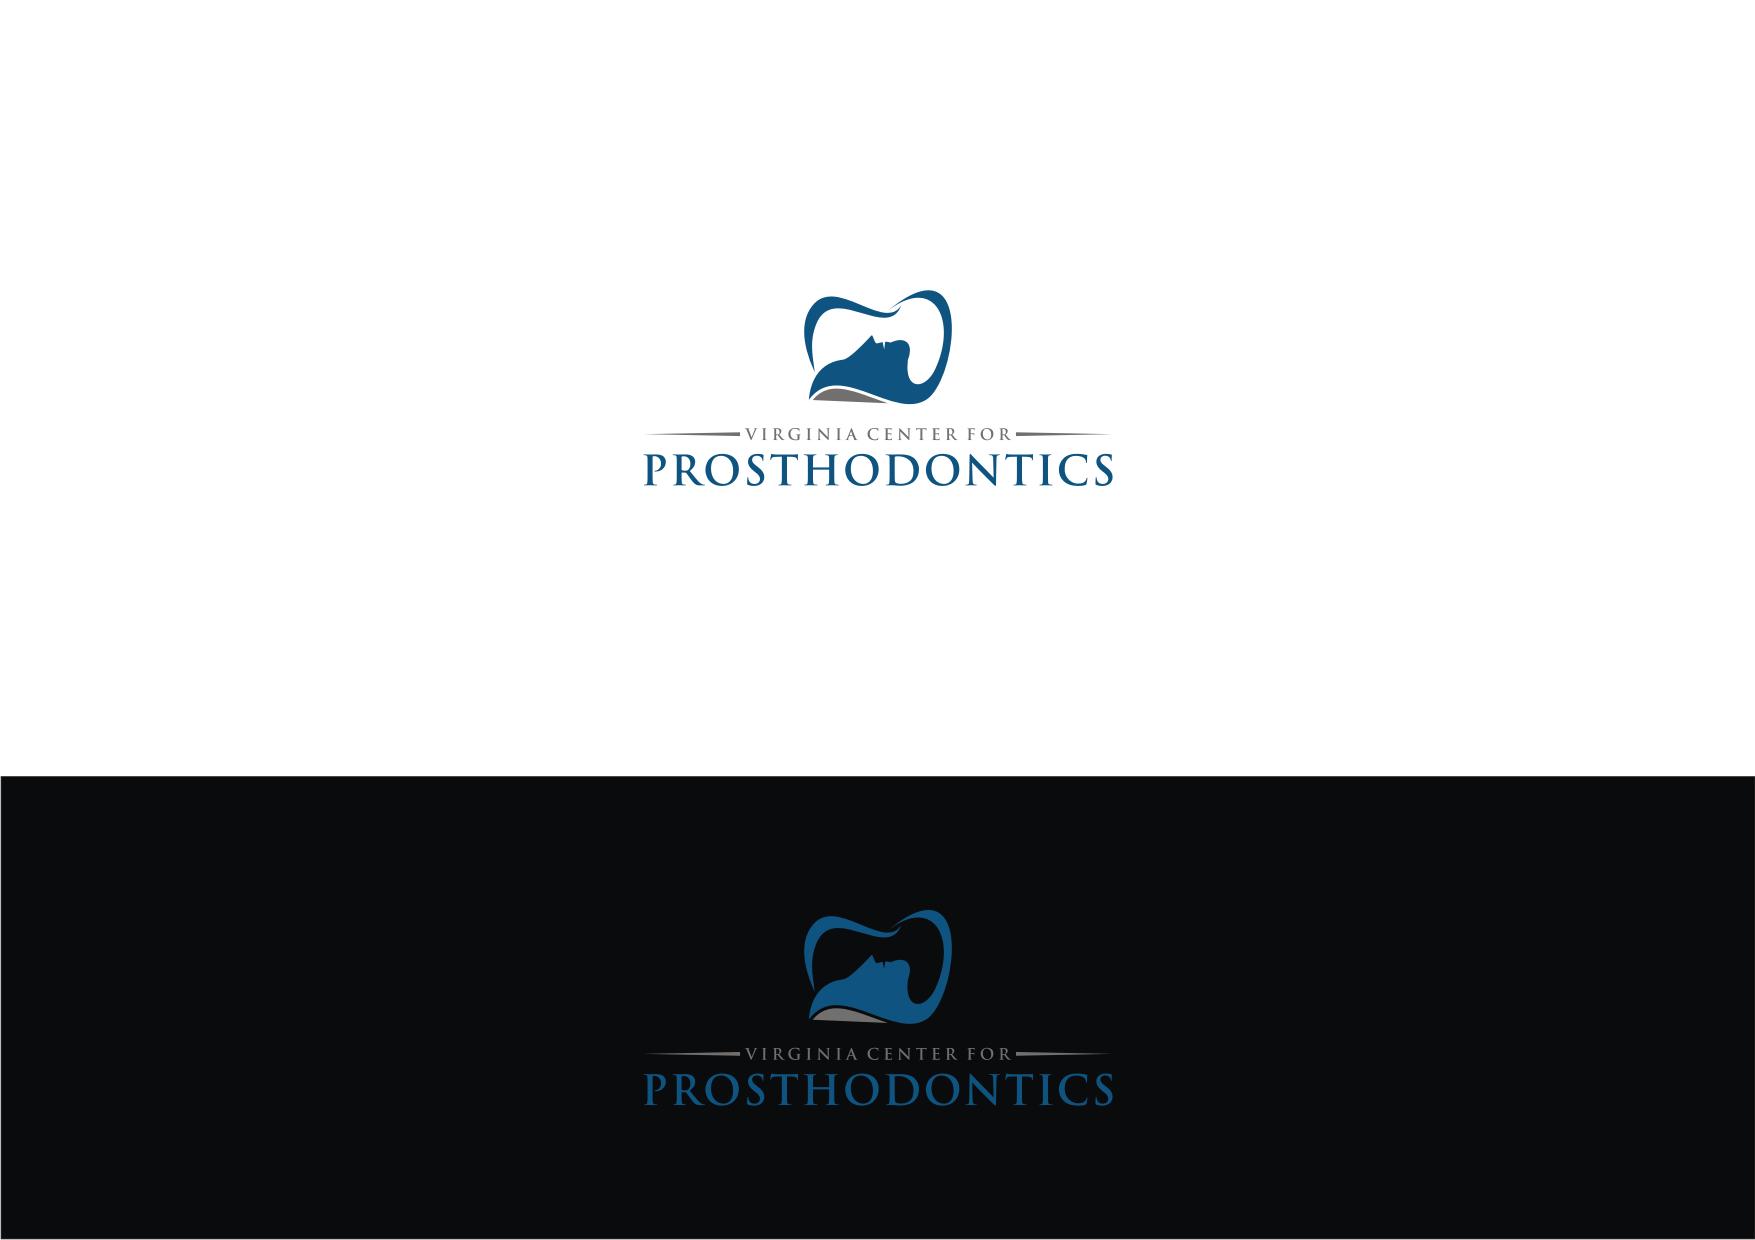 Logo Design by Sigitumarali Sigit - Entry No. 90 in the Logo Design Contest Imaginative Logo Design for Virginia Center for Prosthodontics.